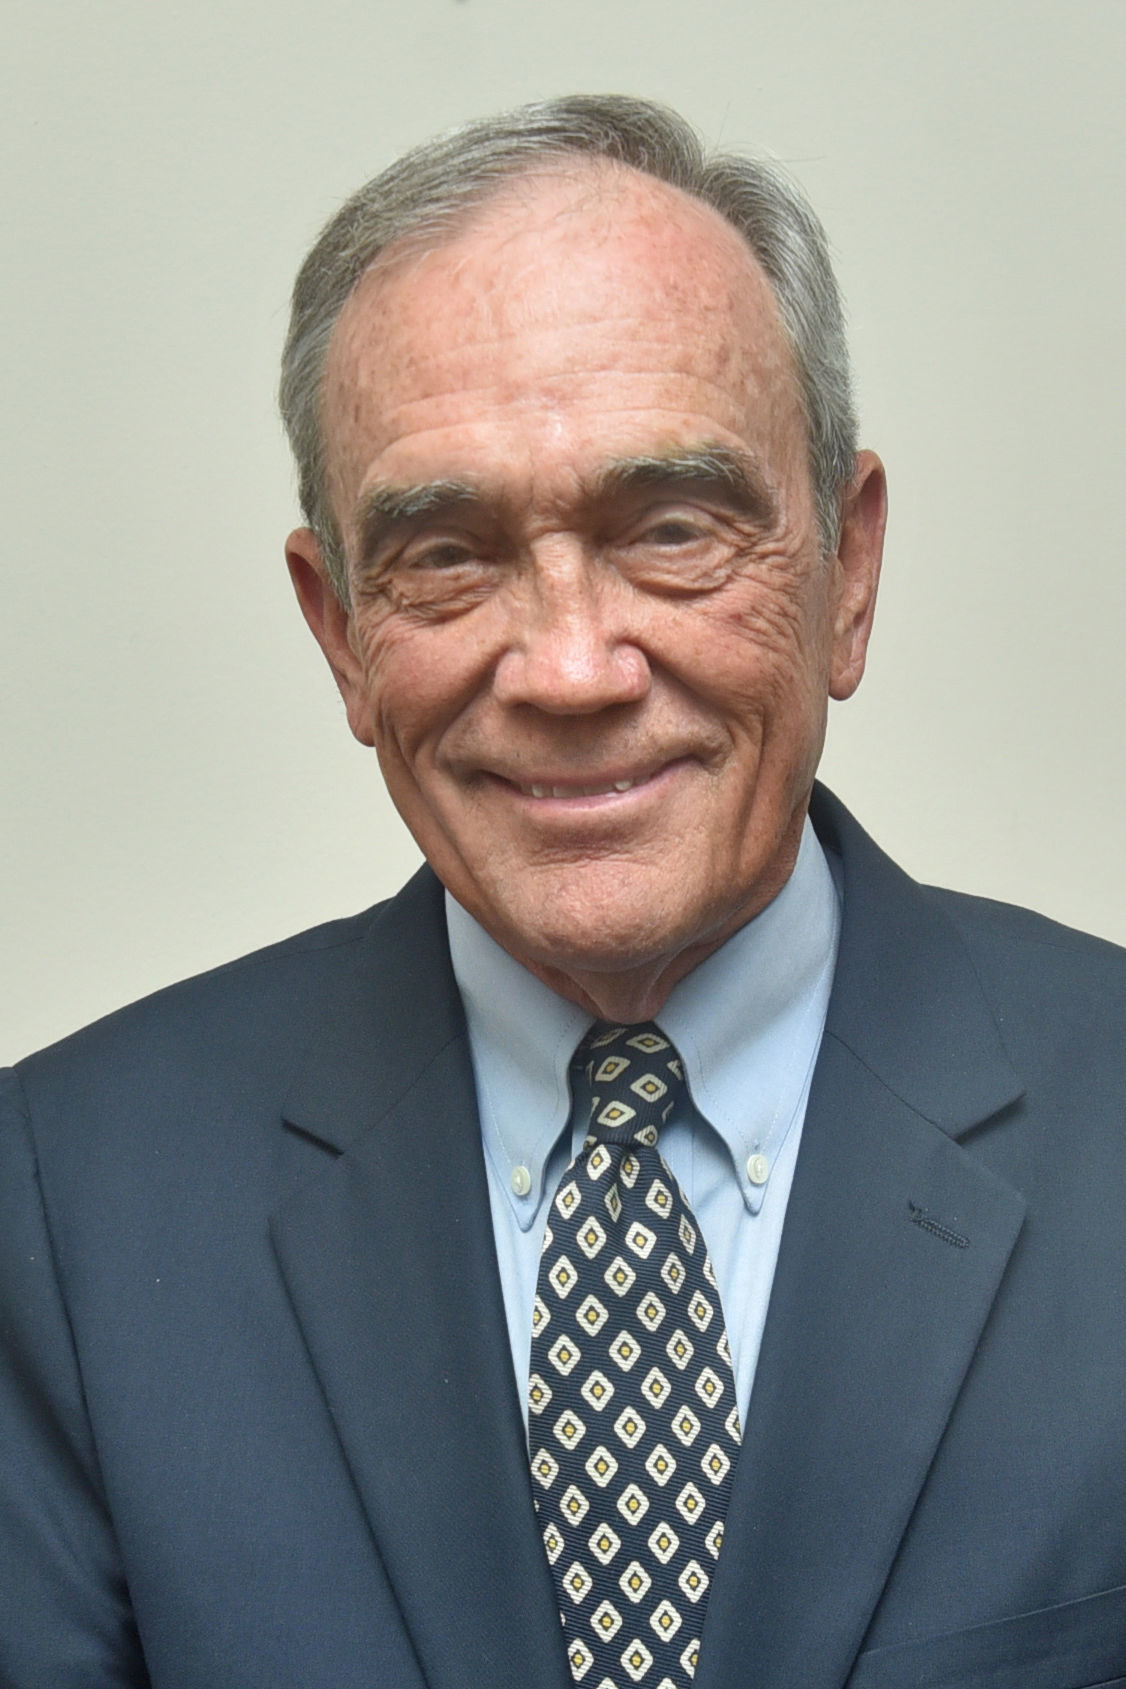 Dr. James Gaskell